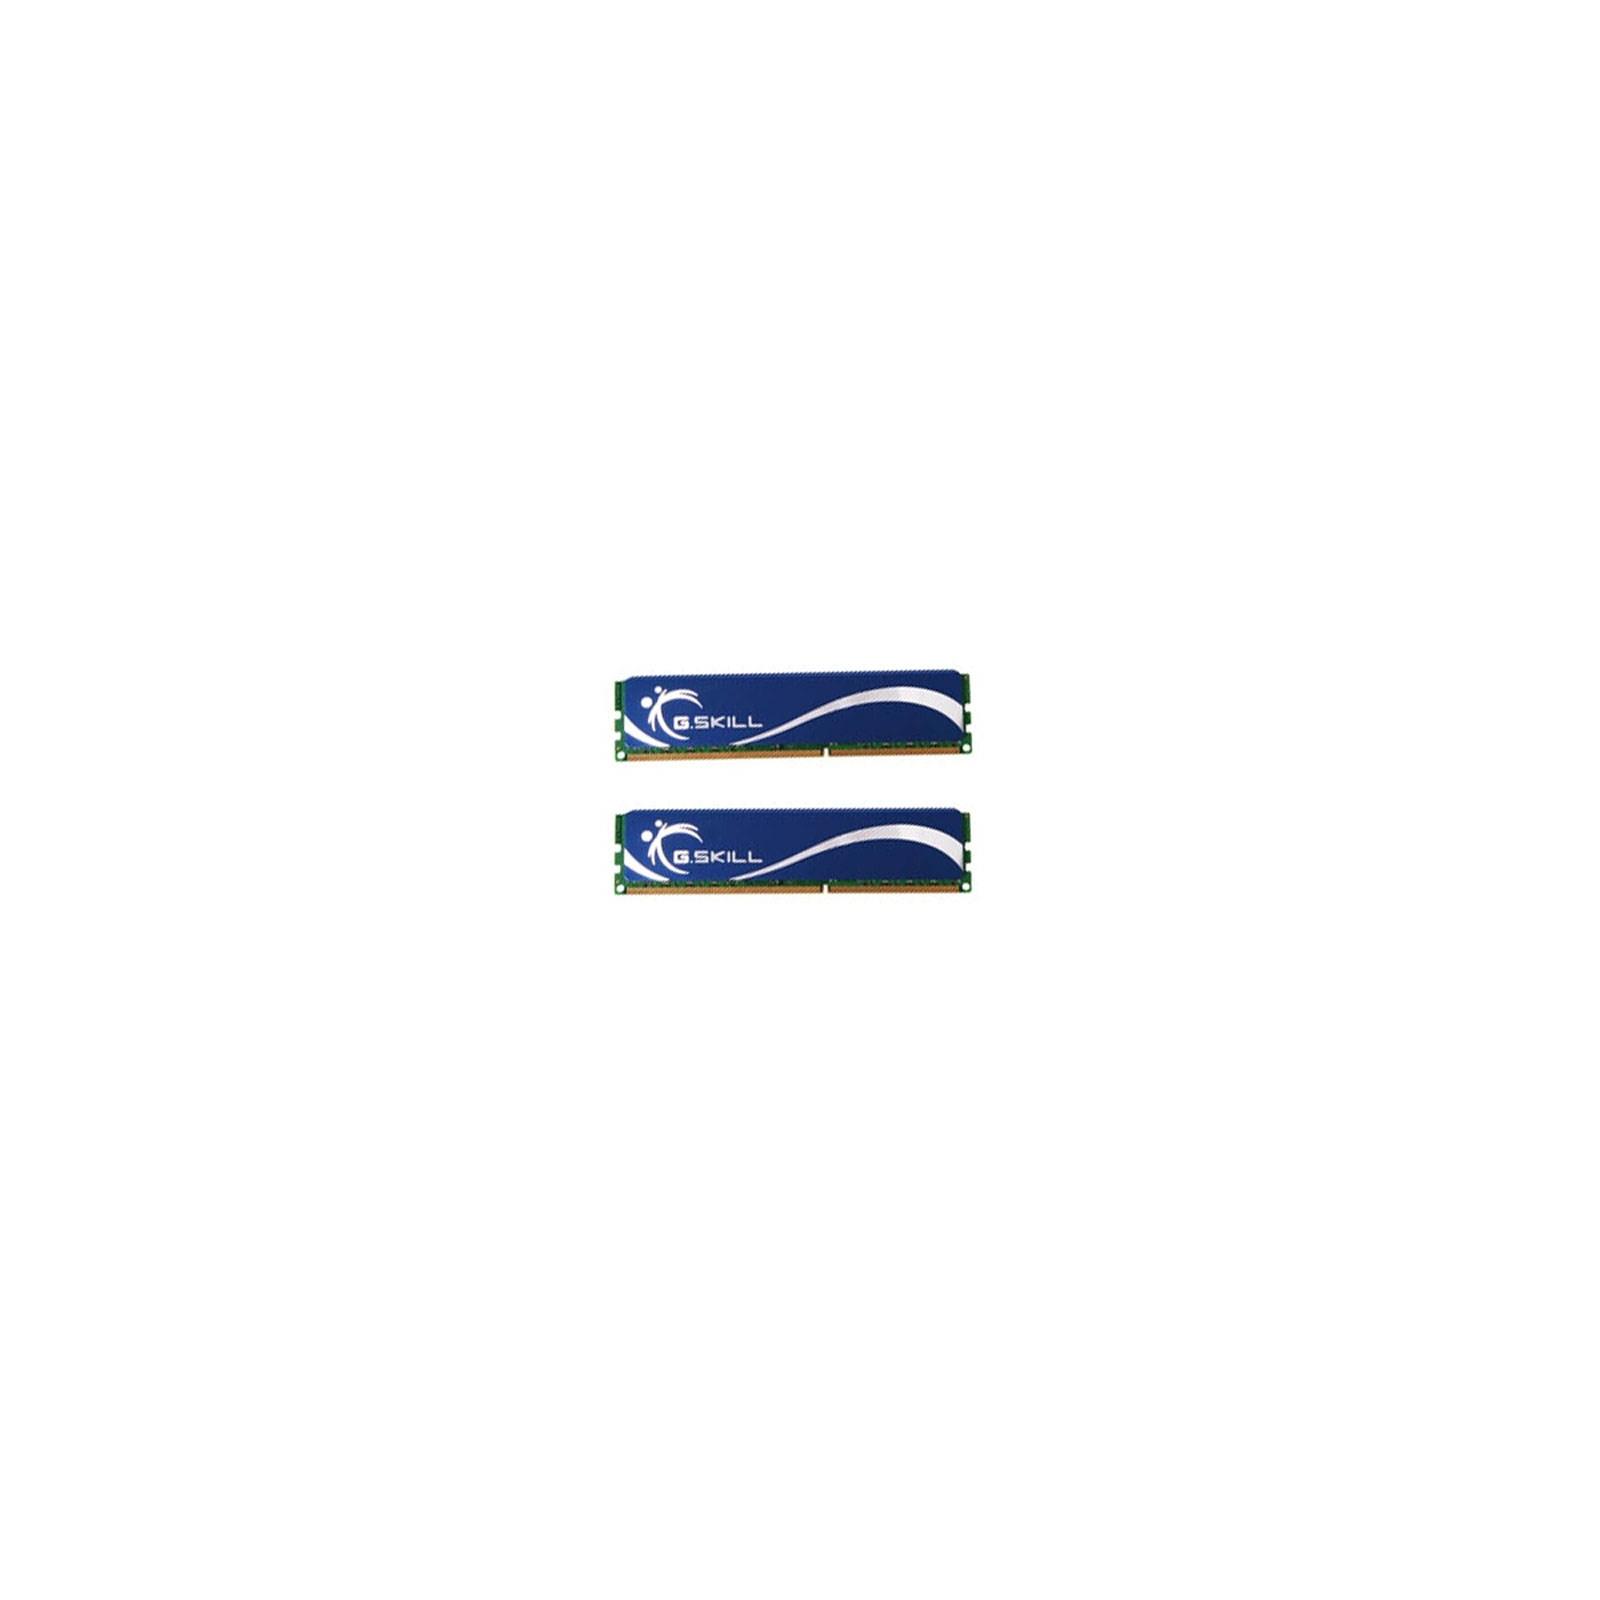 Модуль памяти для компьютера DDR3 4GB (2x2GB) 1333 MHz G.Skill (F3-10600CL8D-4GBHK)